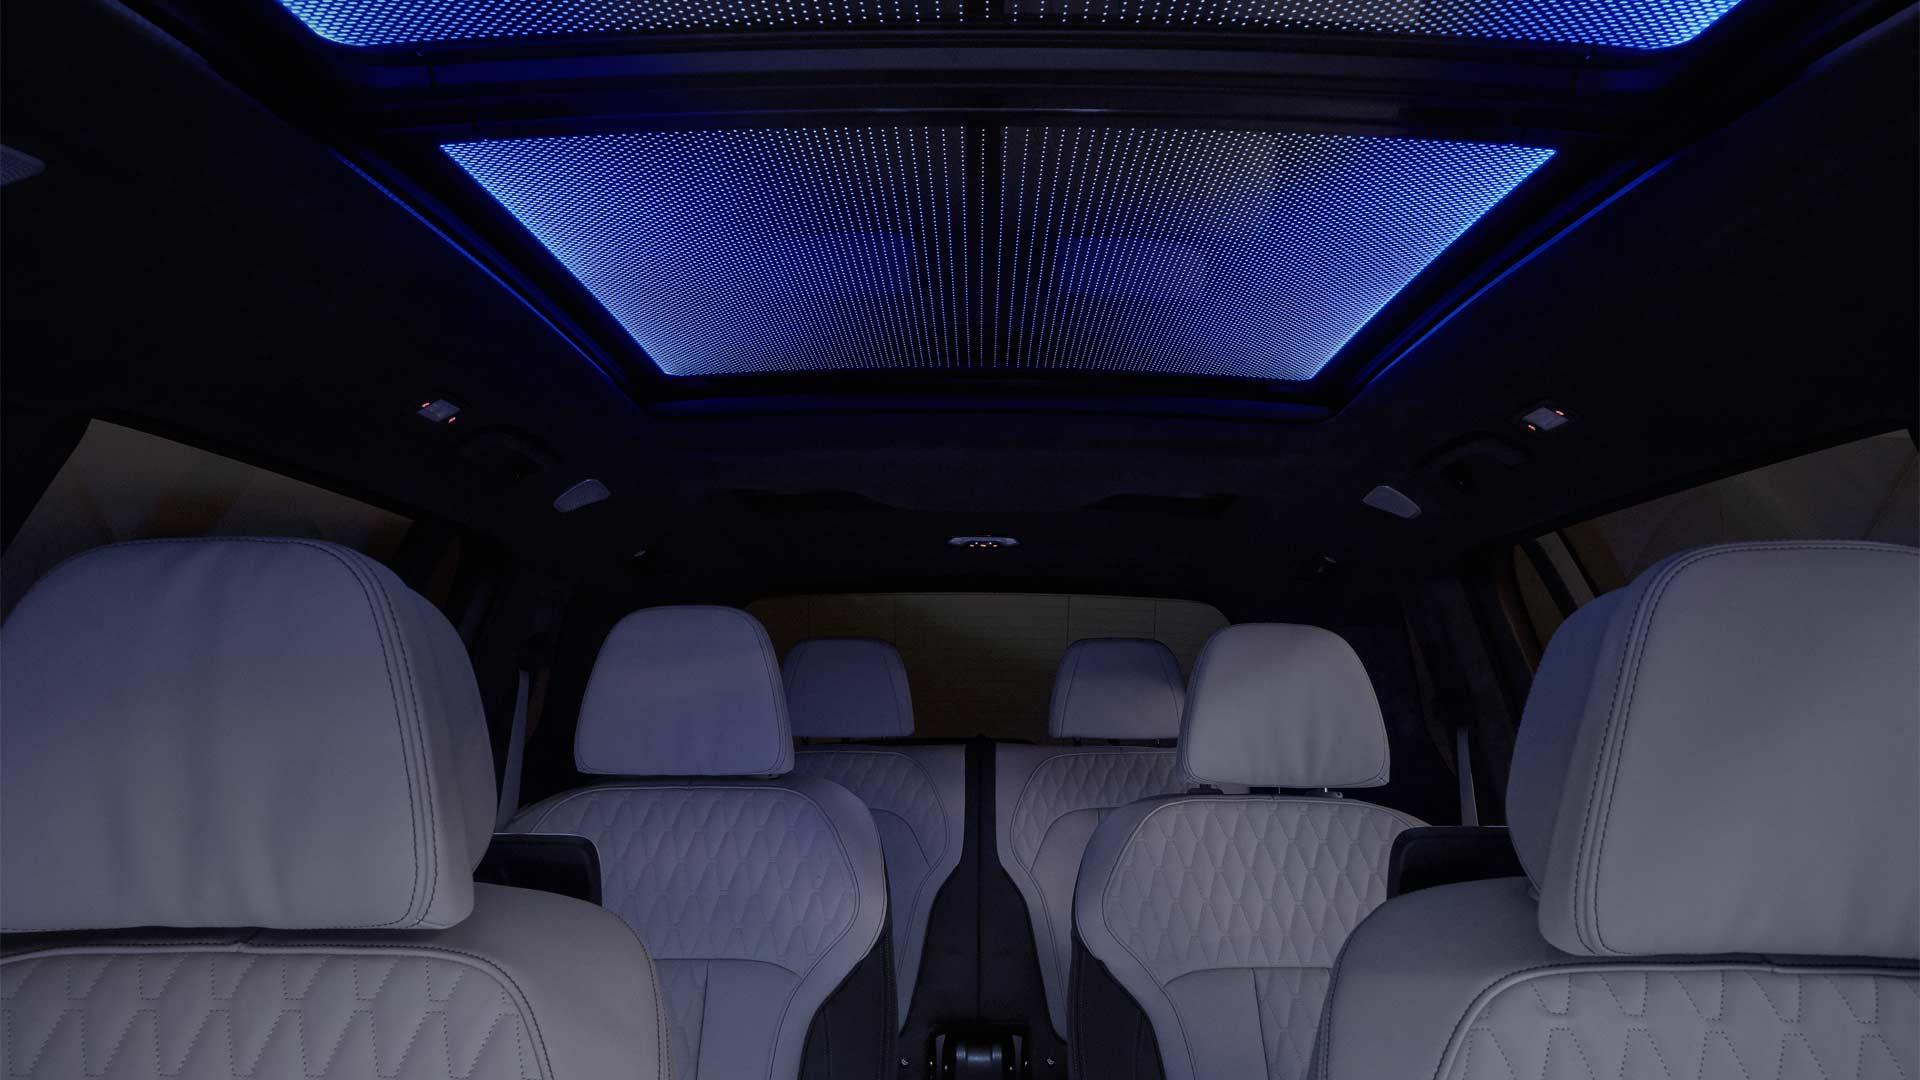 2019-BMW-X7-Interior_6